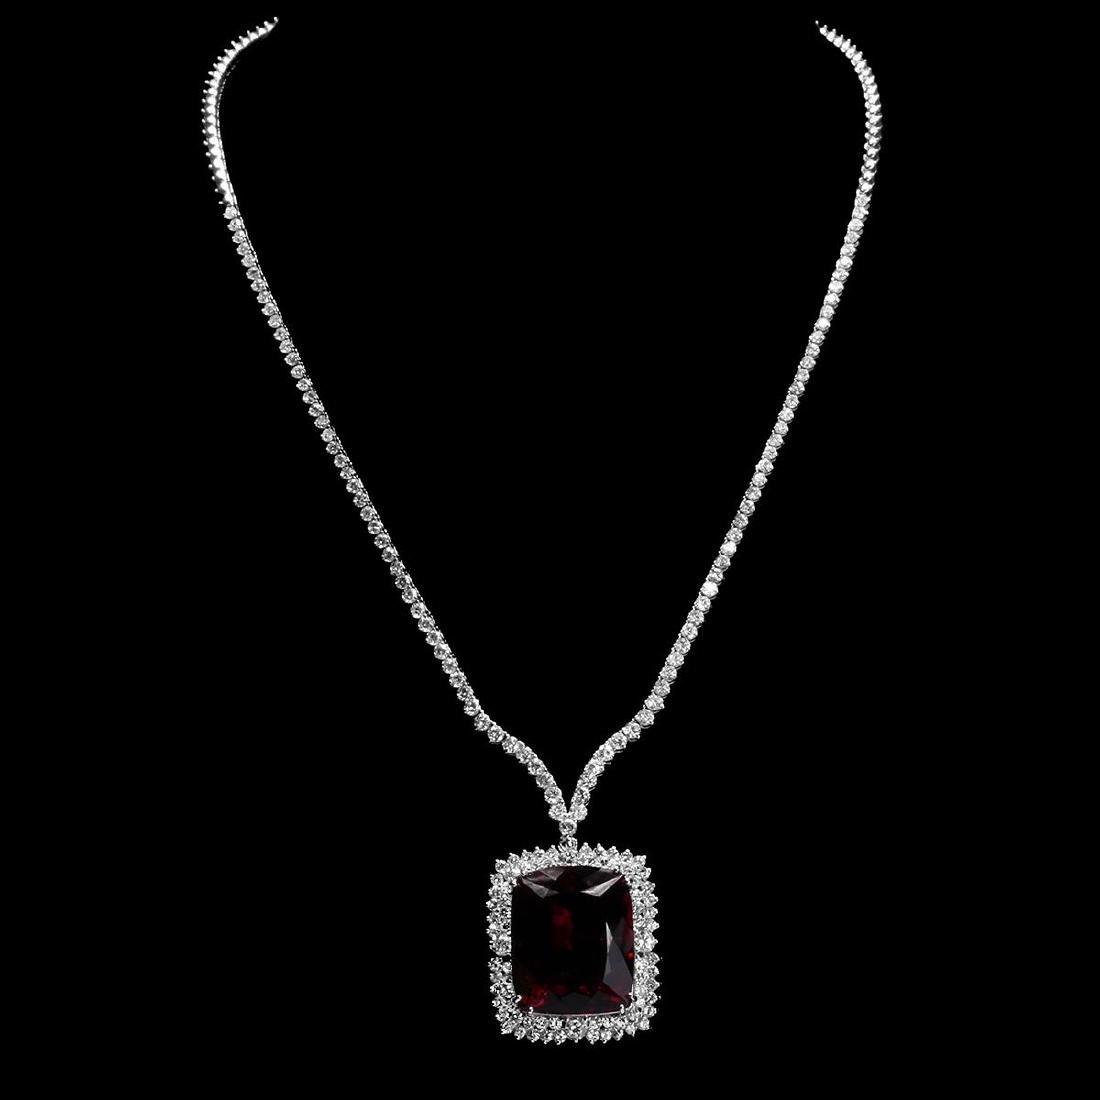 18k White Gold 33.36ct Tourmaline 7.35ct Diamond